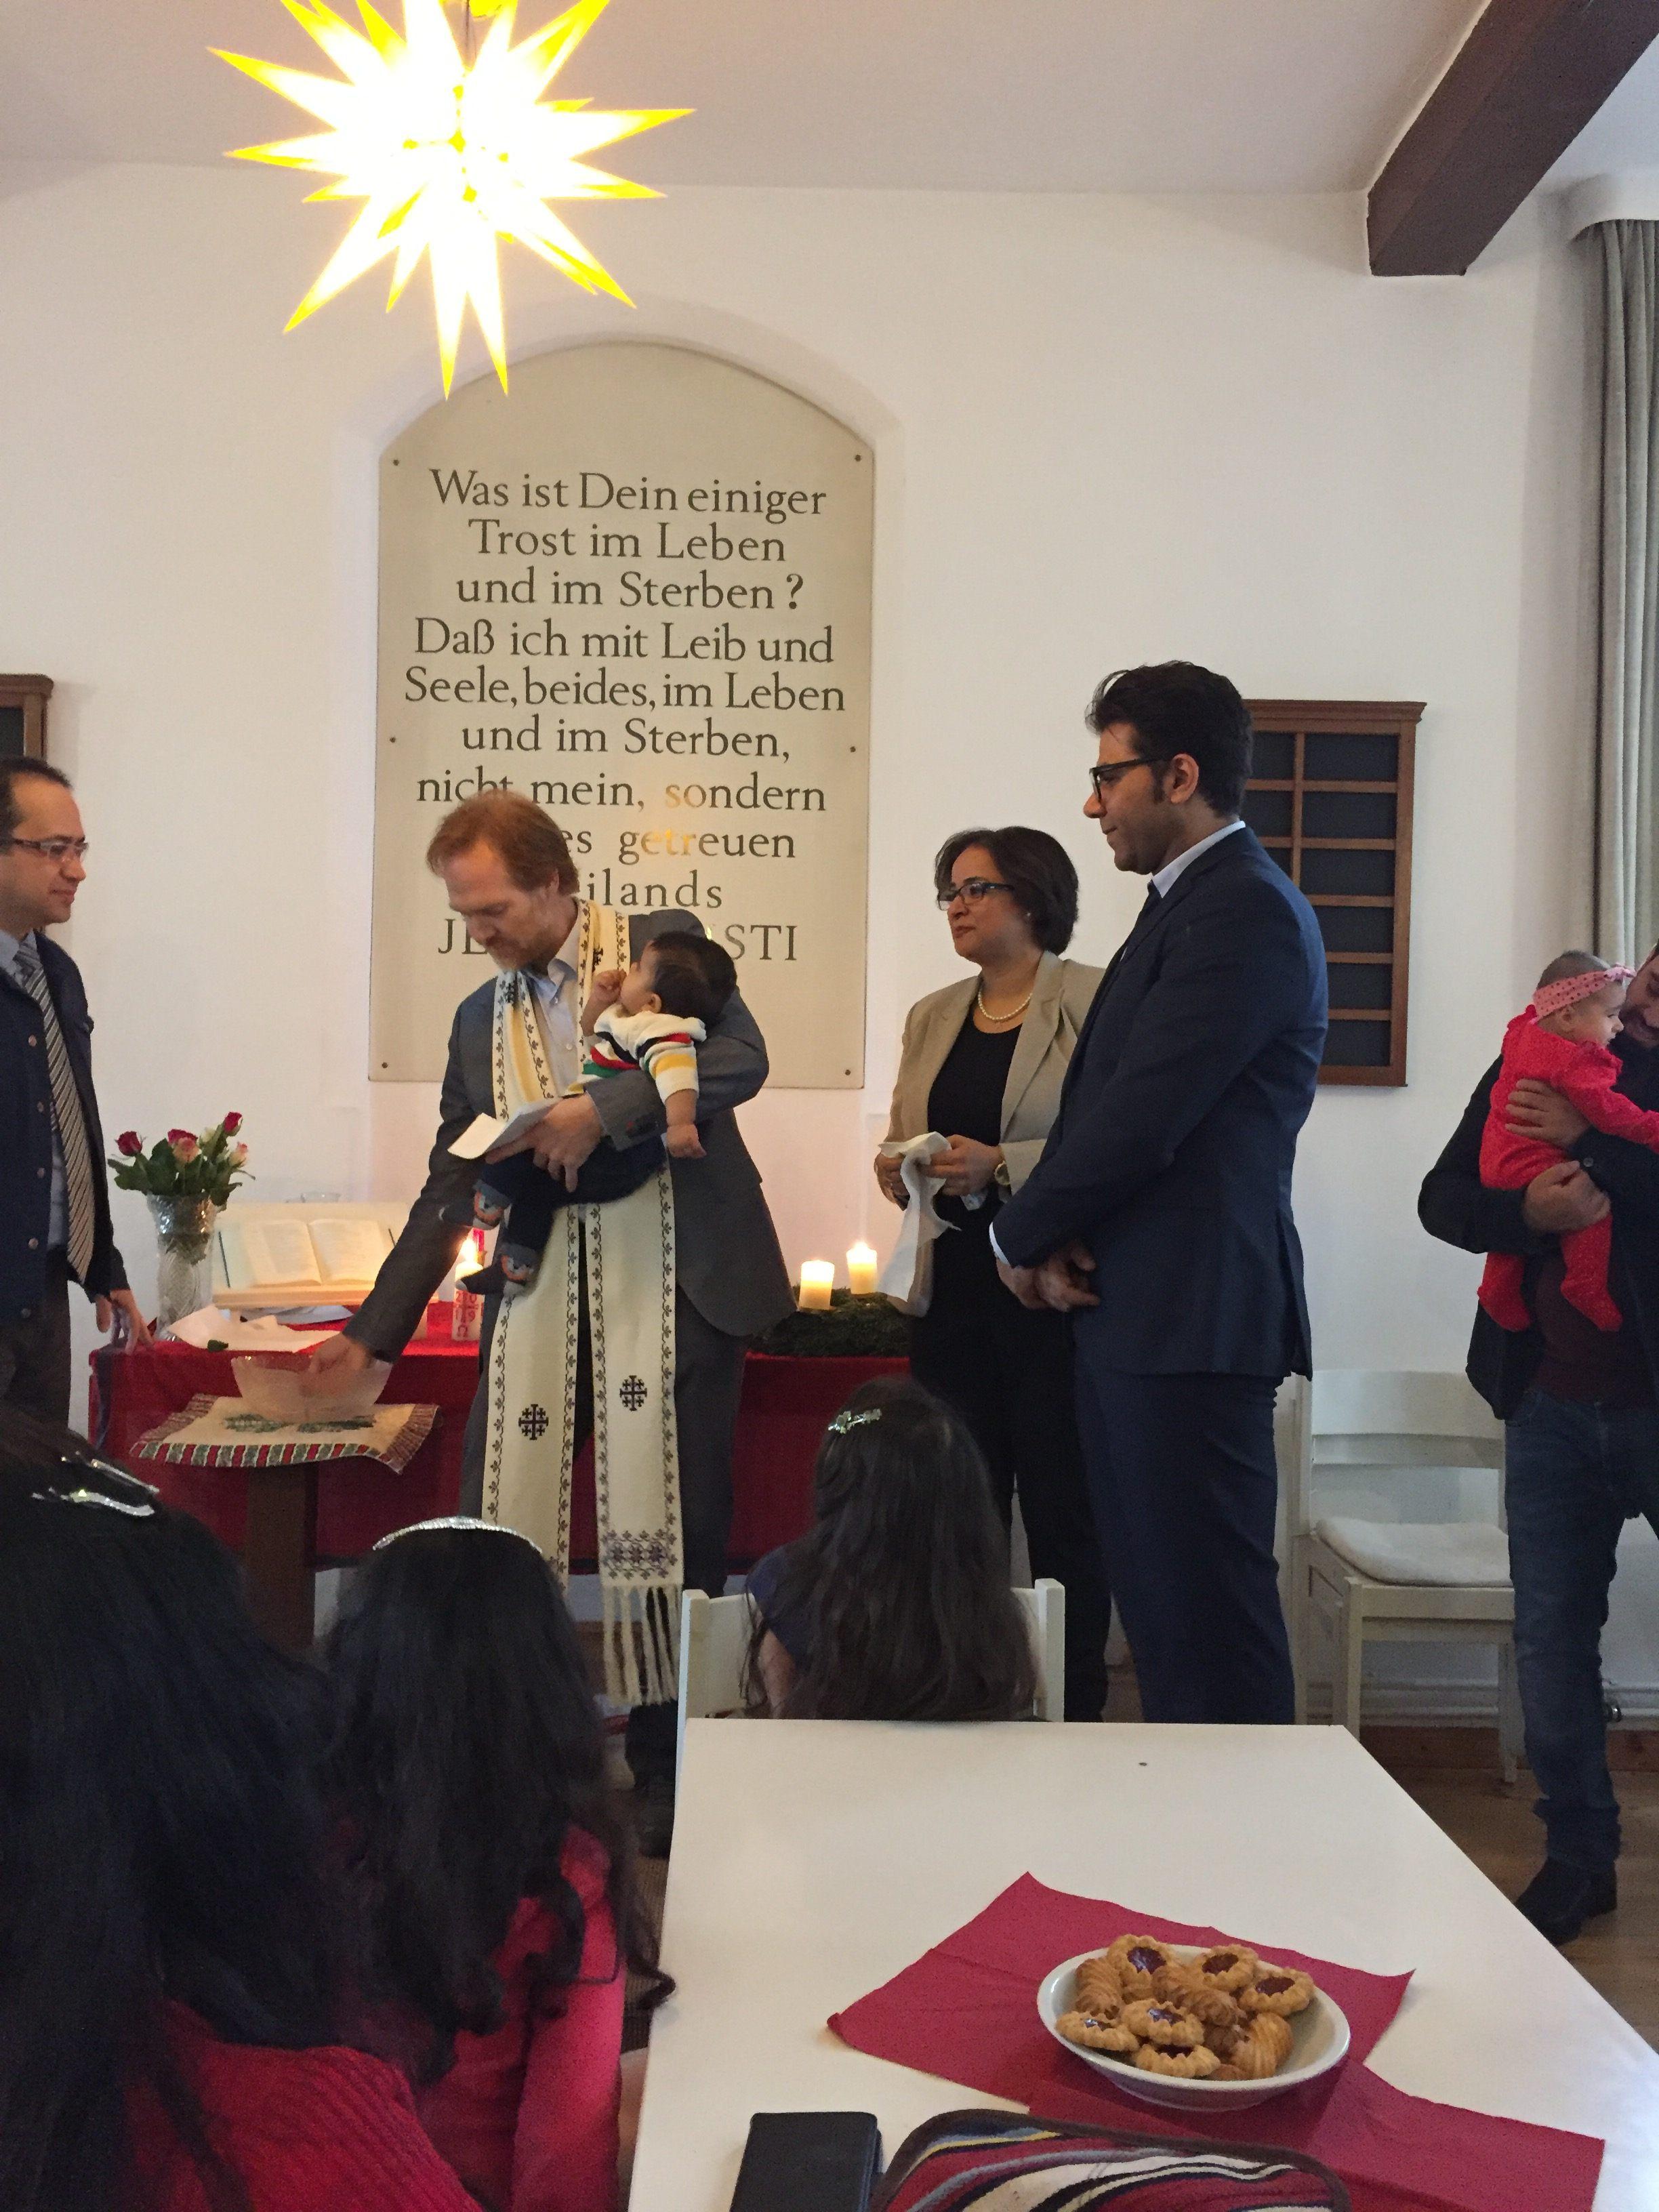 Baptism during the Christmas celebration.